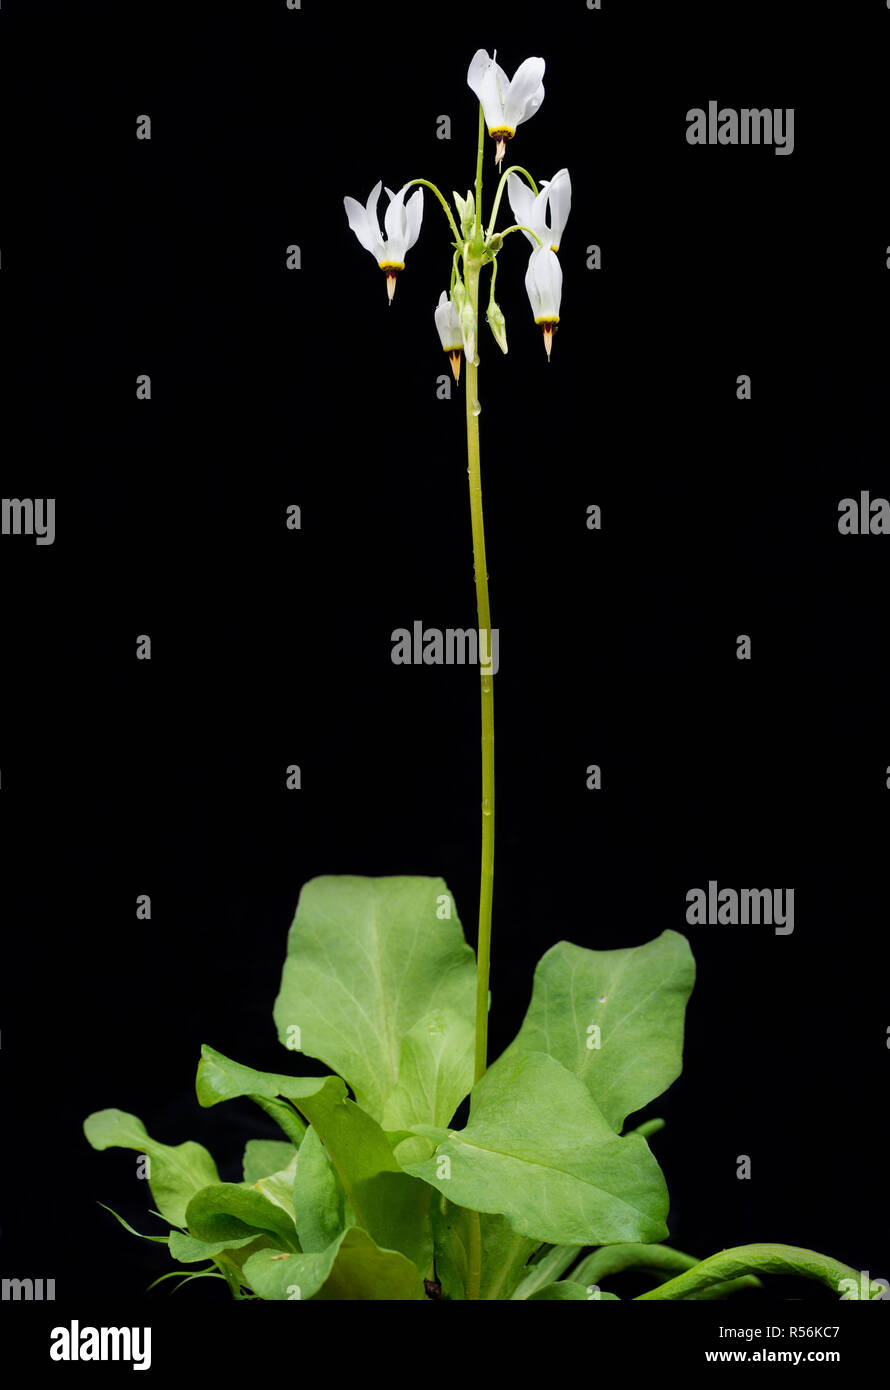 White shooting star wildflower in garden in central Virginia - Stock Image